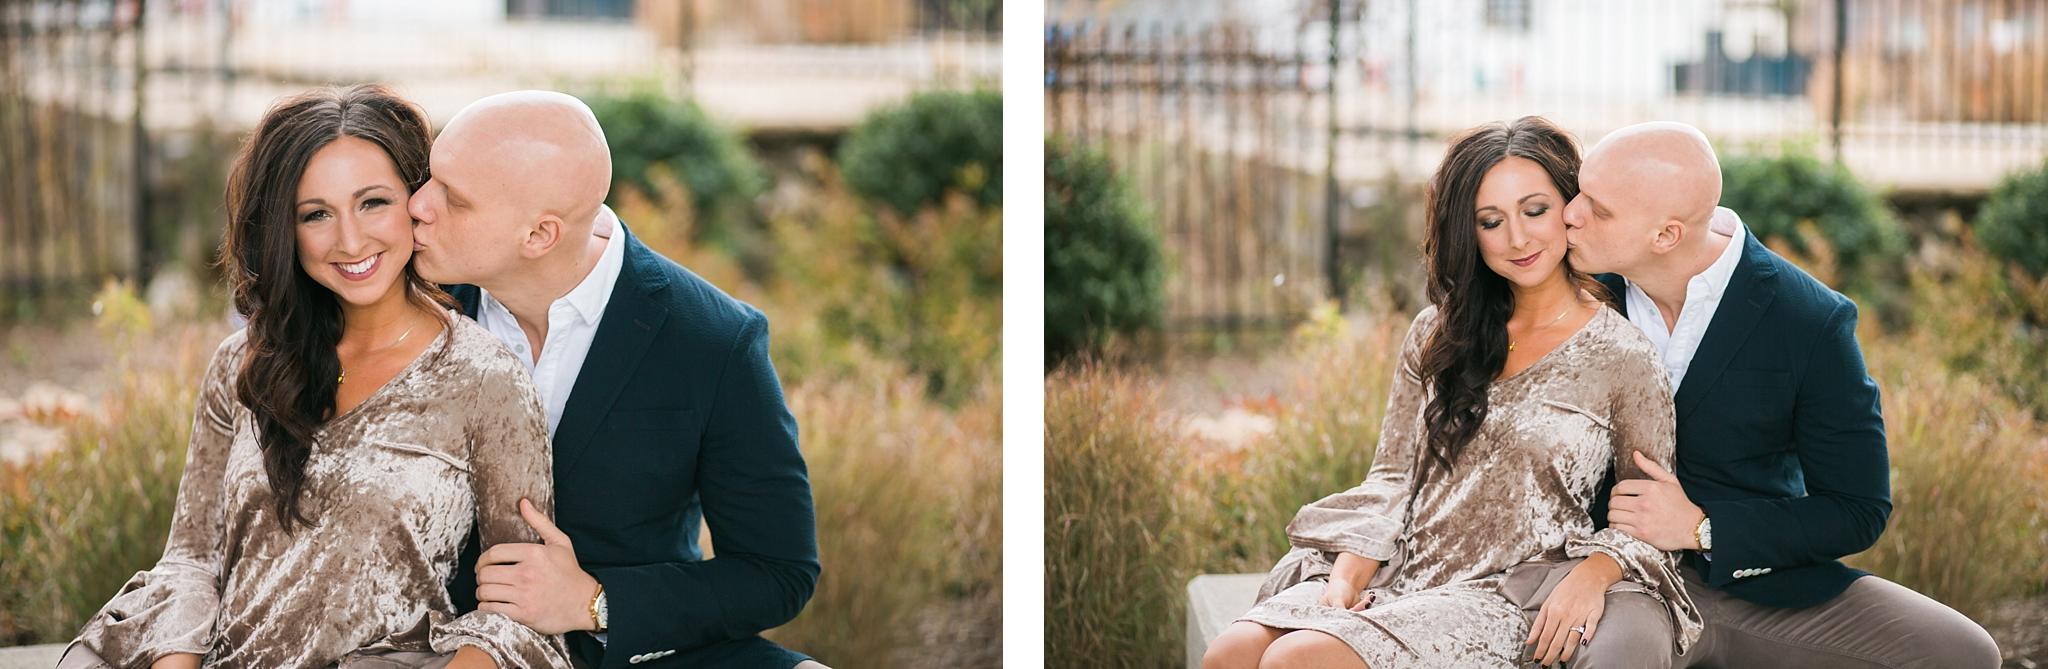 the-gulch-wedding-photographer.jpg